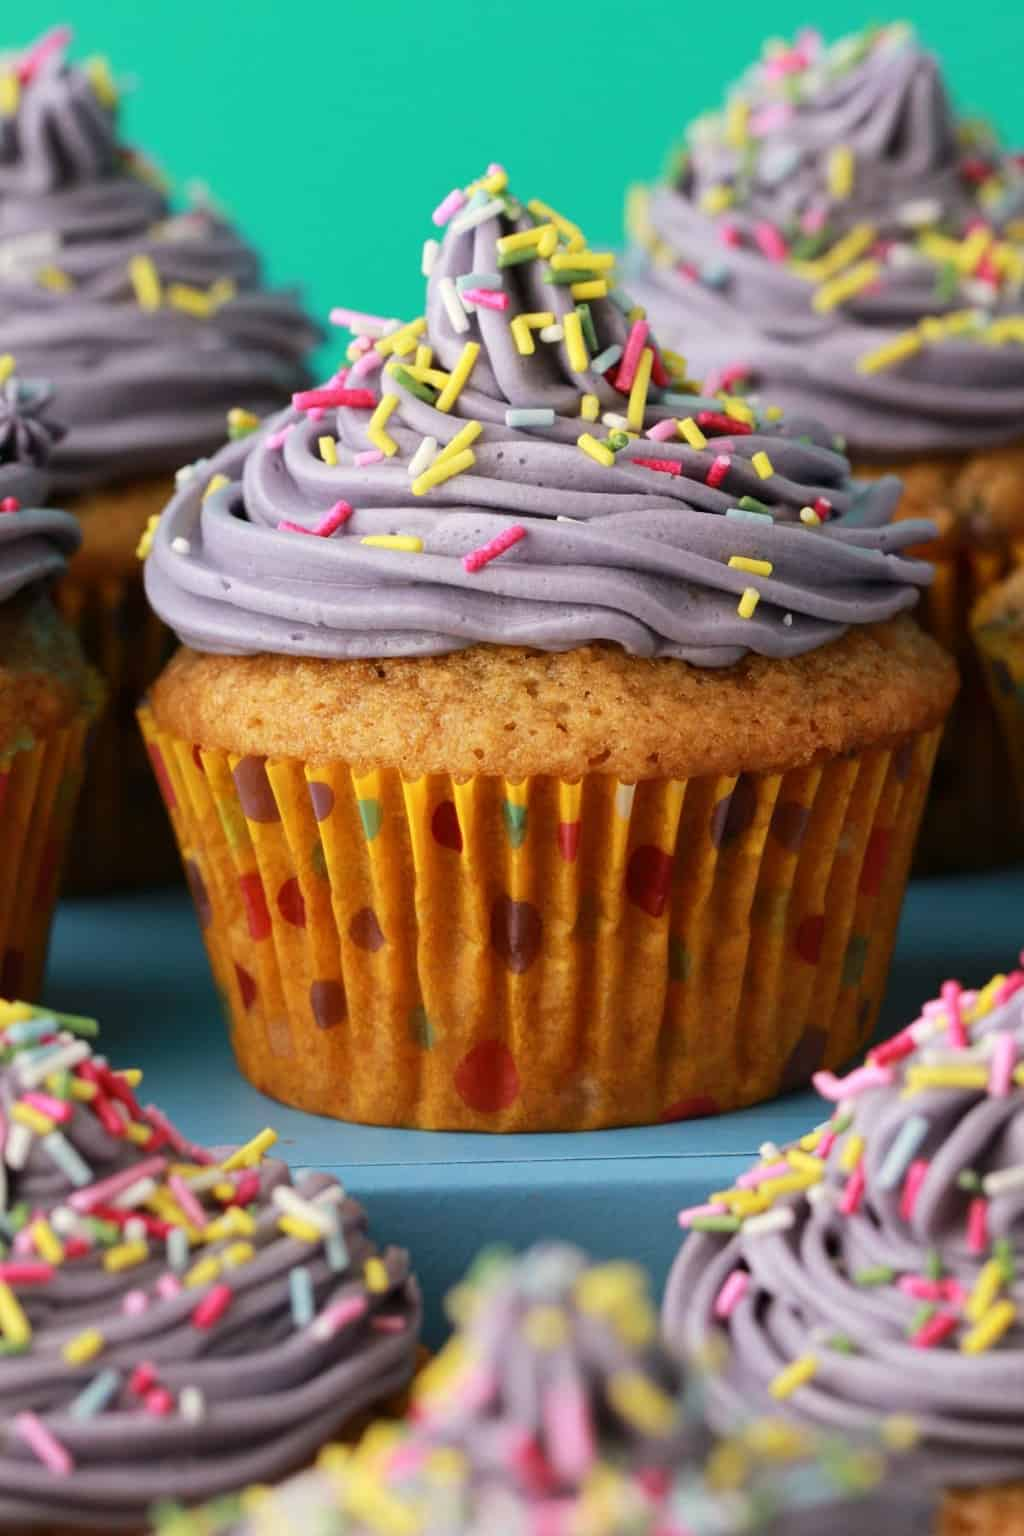 Gorgeously colorful vegan funfetti cupcakes. Moist, light and fluffy vegan cupcakes with purple frosting and plenty of sprinkles! #vegan #lovingitvegan #cupcakes #dessert #funfetti